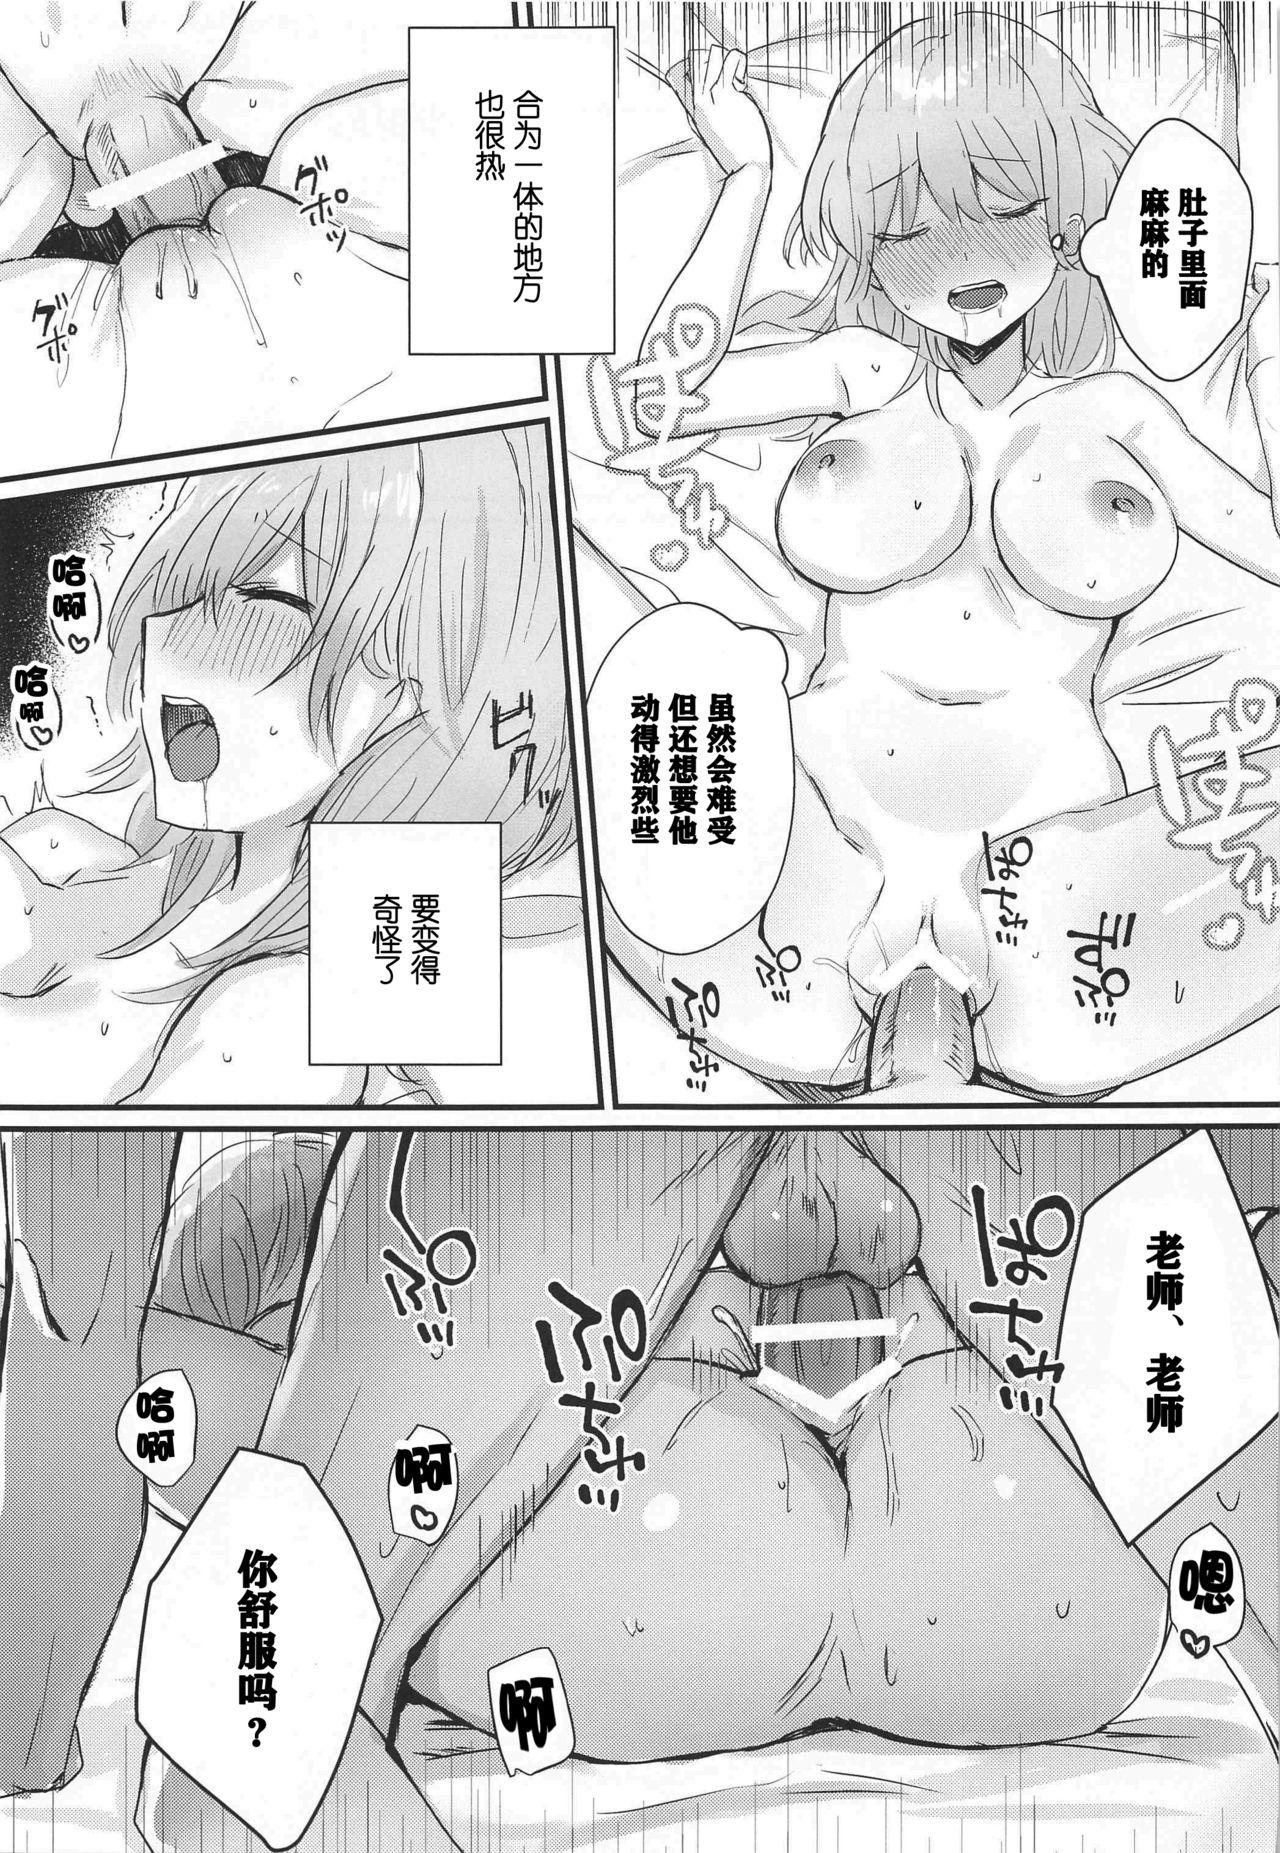 Sensei no Hatena - What the professor doesn't know 20